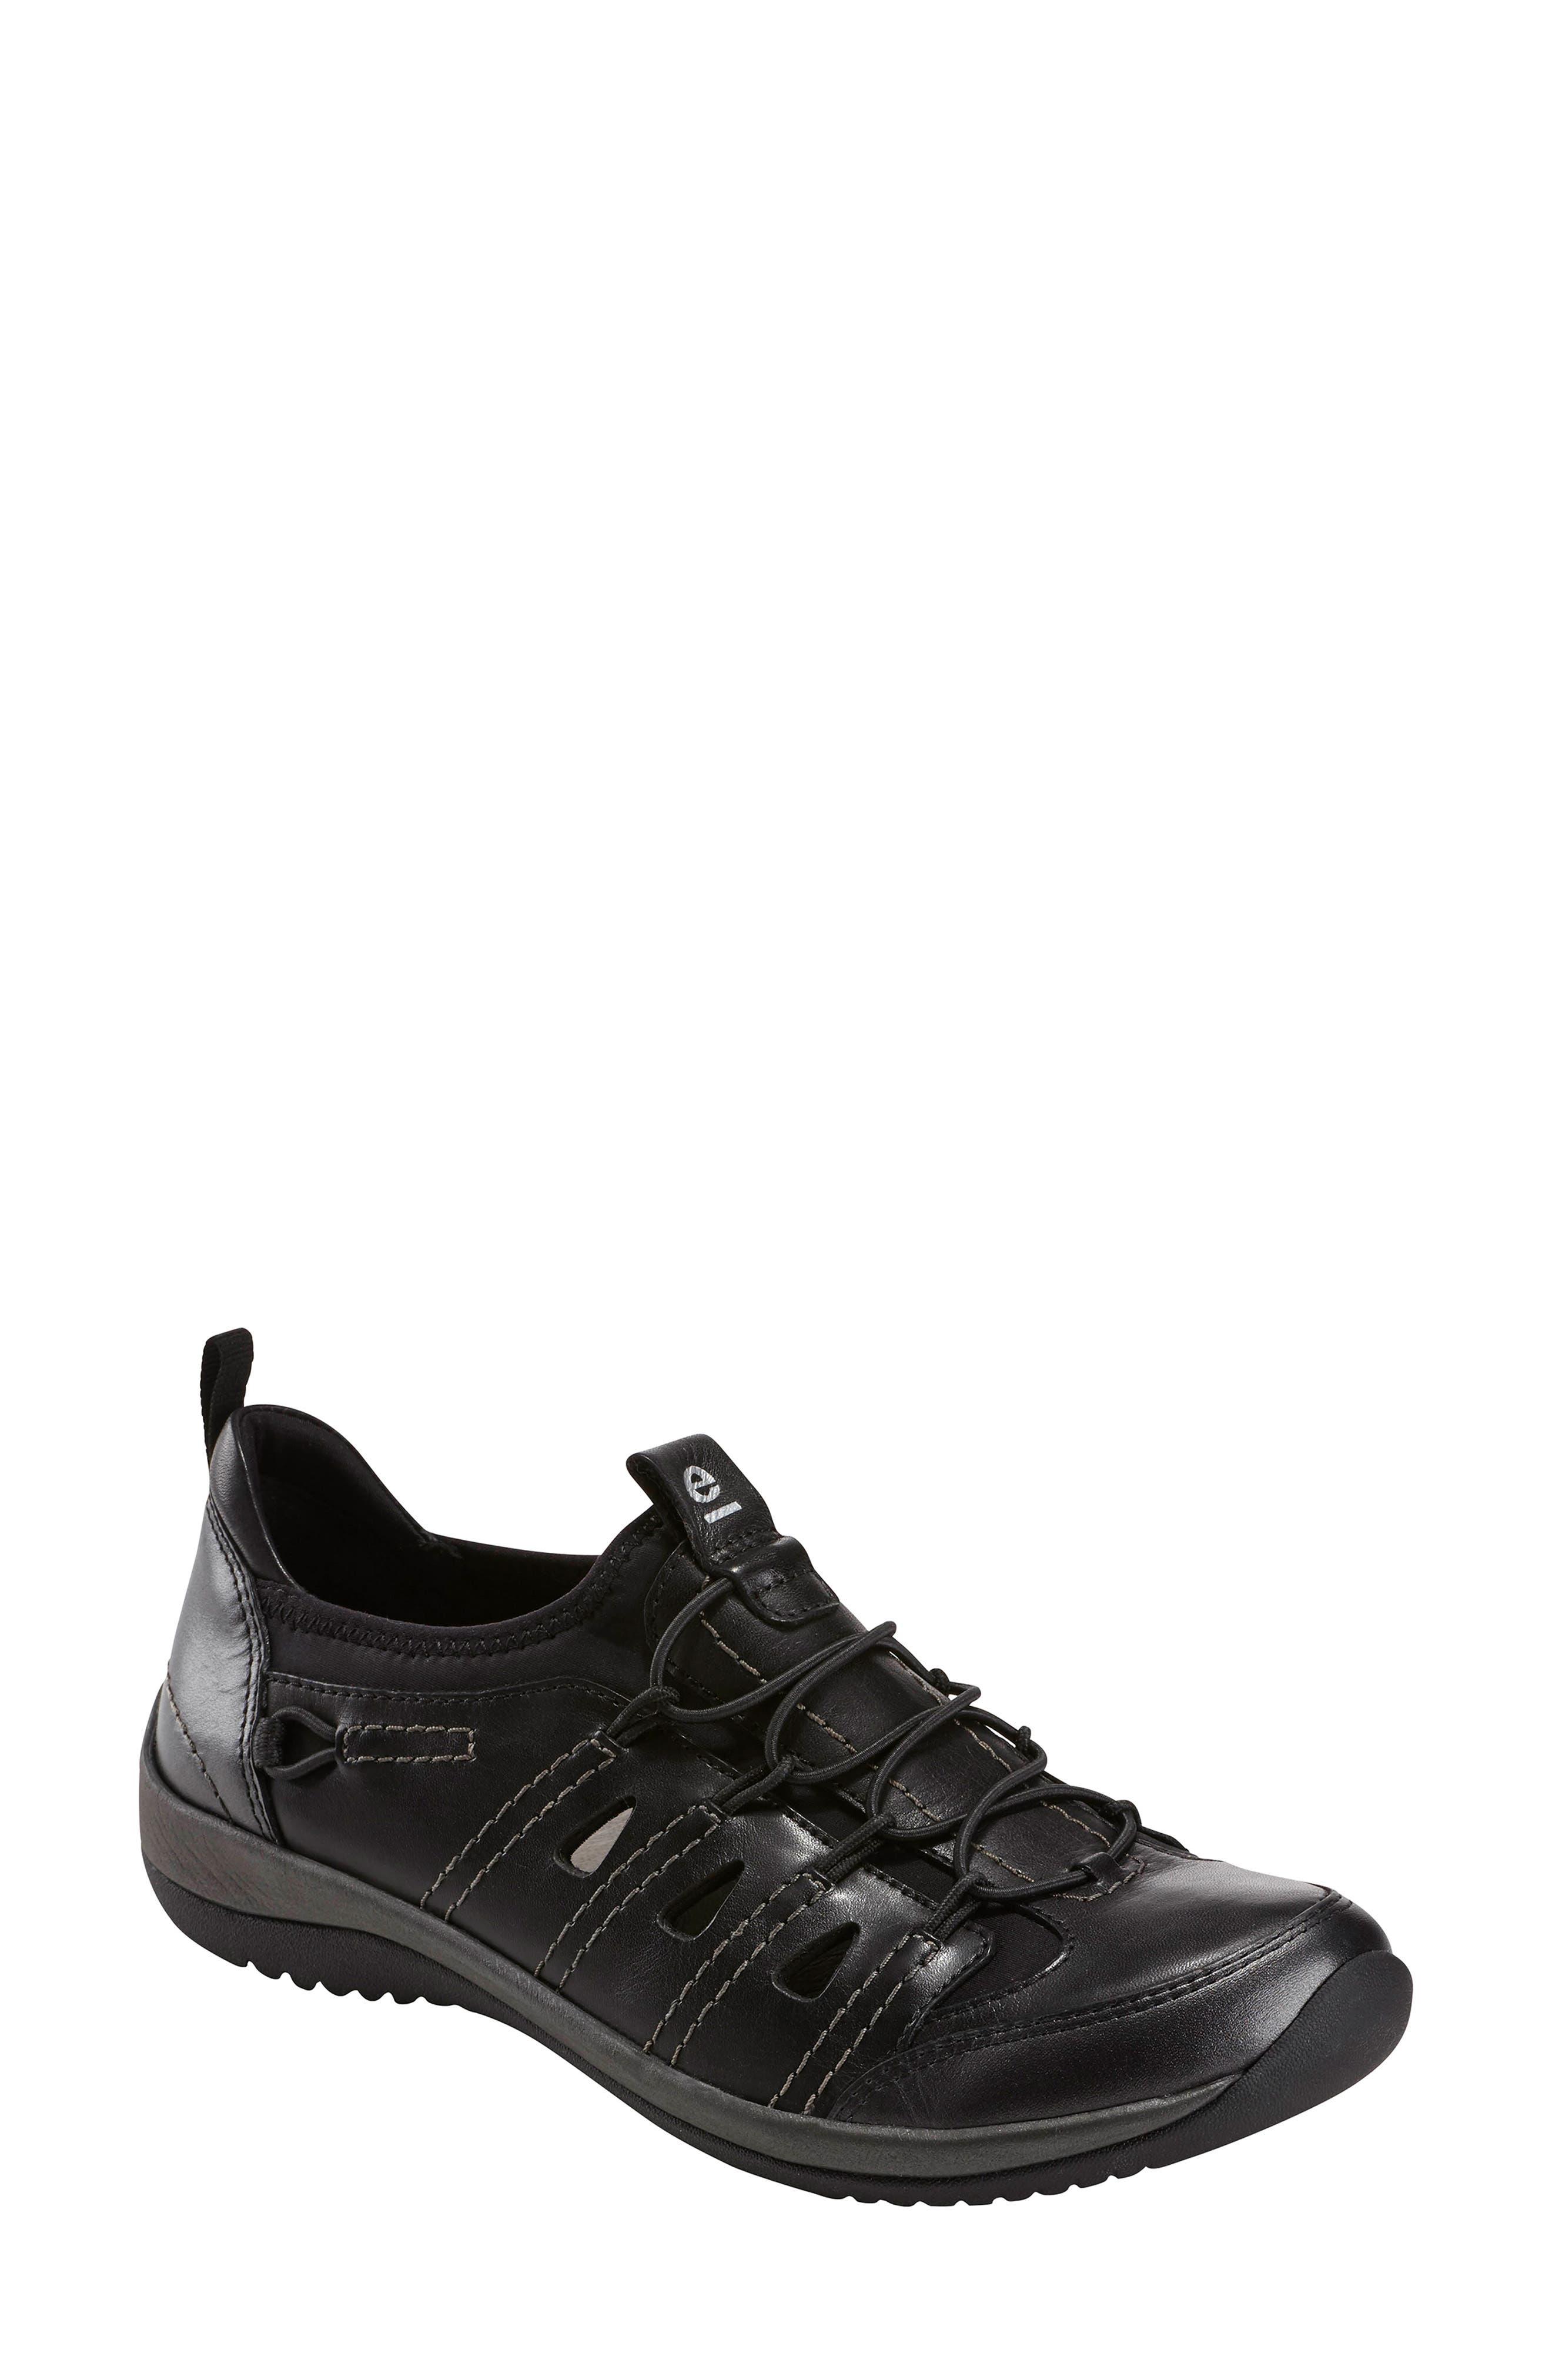 Earth Goodall Sneaker, Black